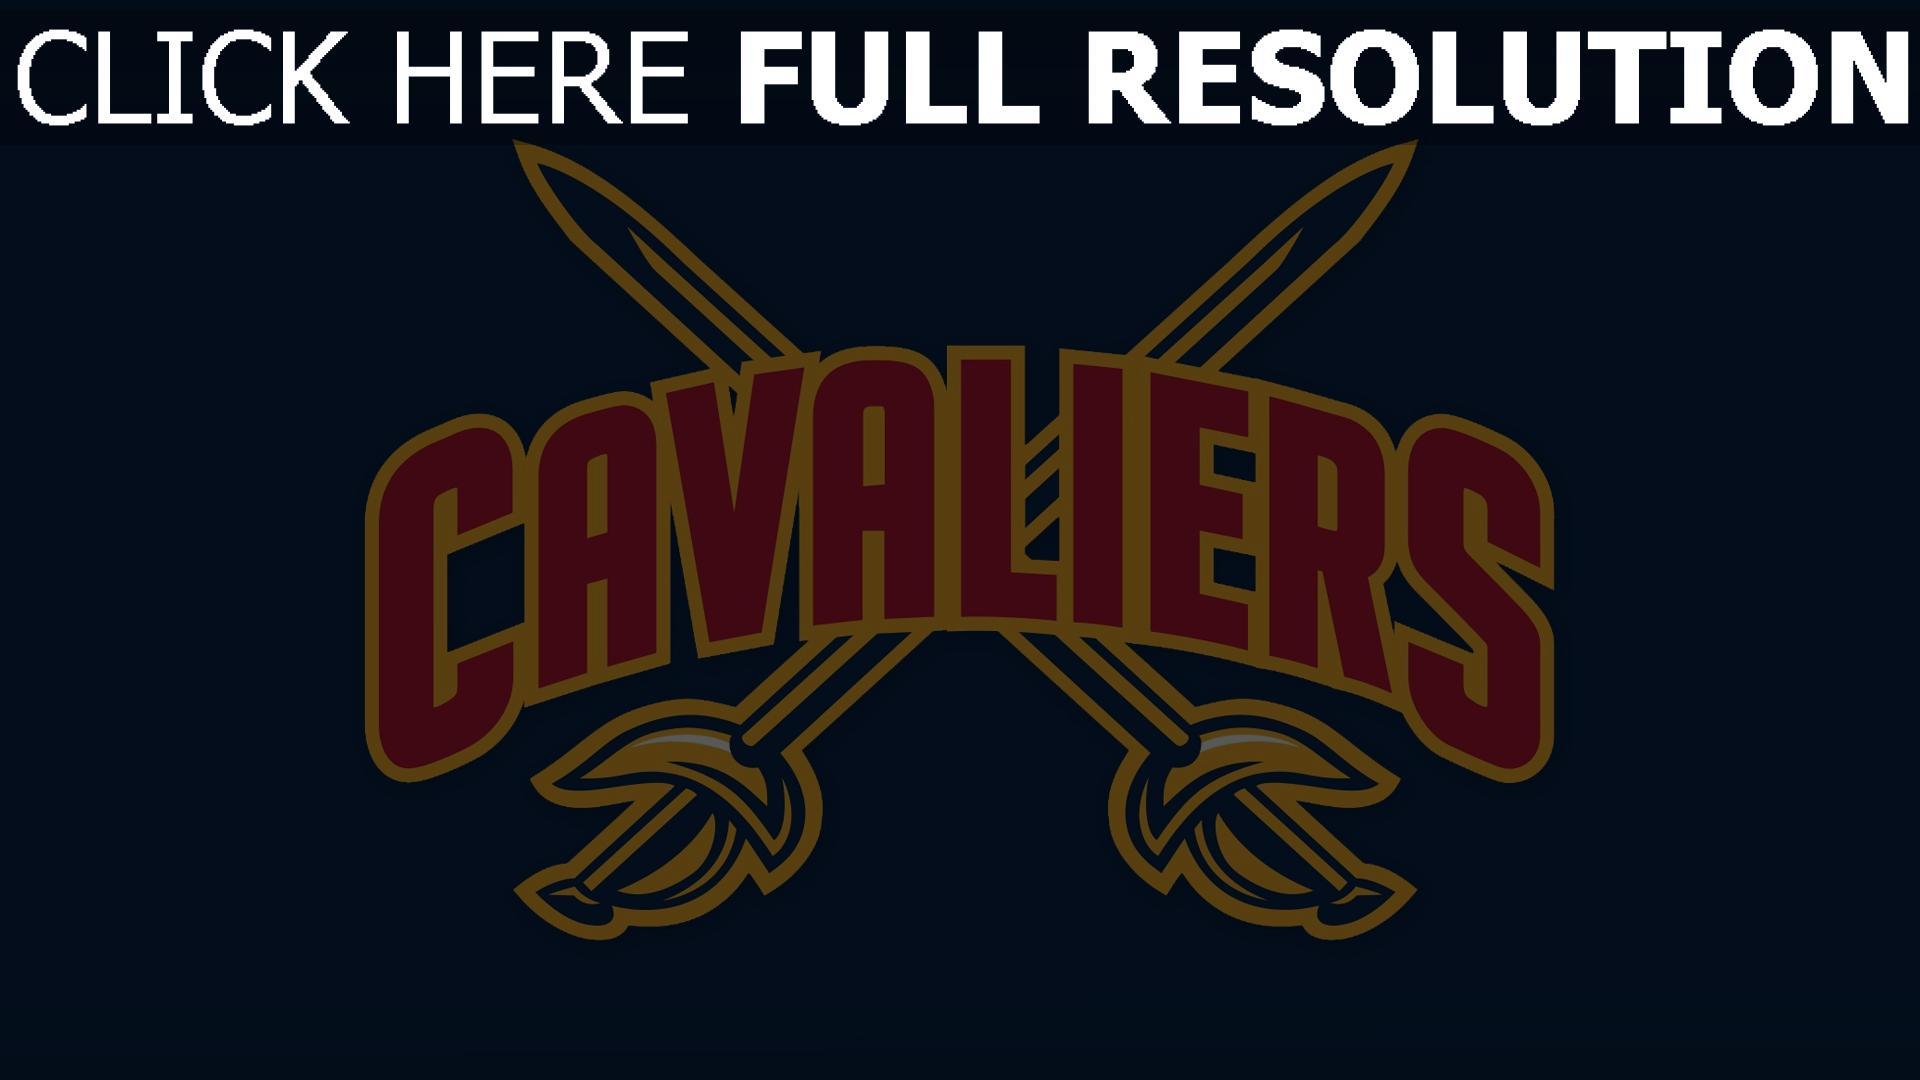 hd hintergrundbilder cleveland cavaliers logo basketball 1920x1080